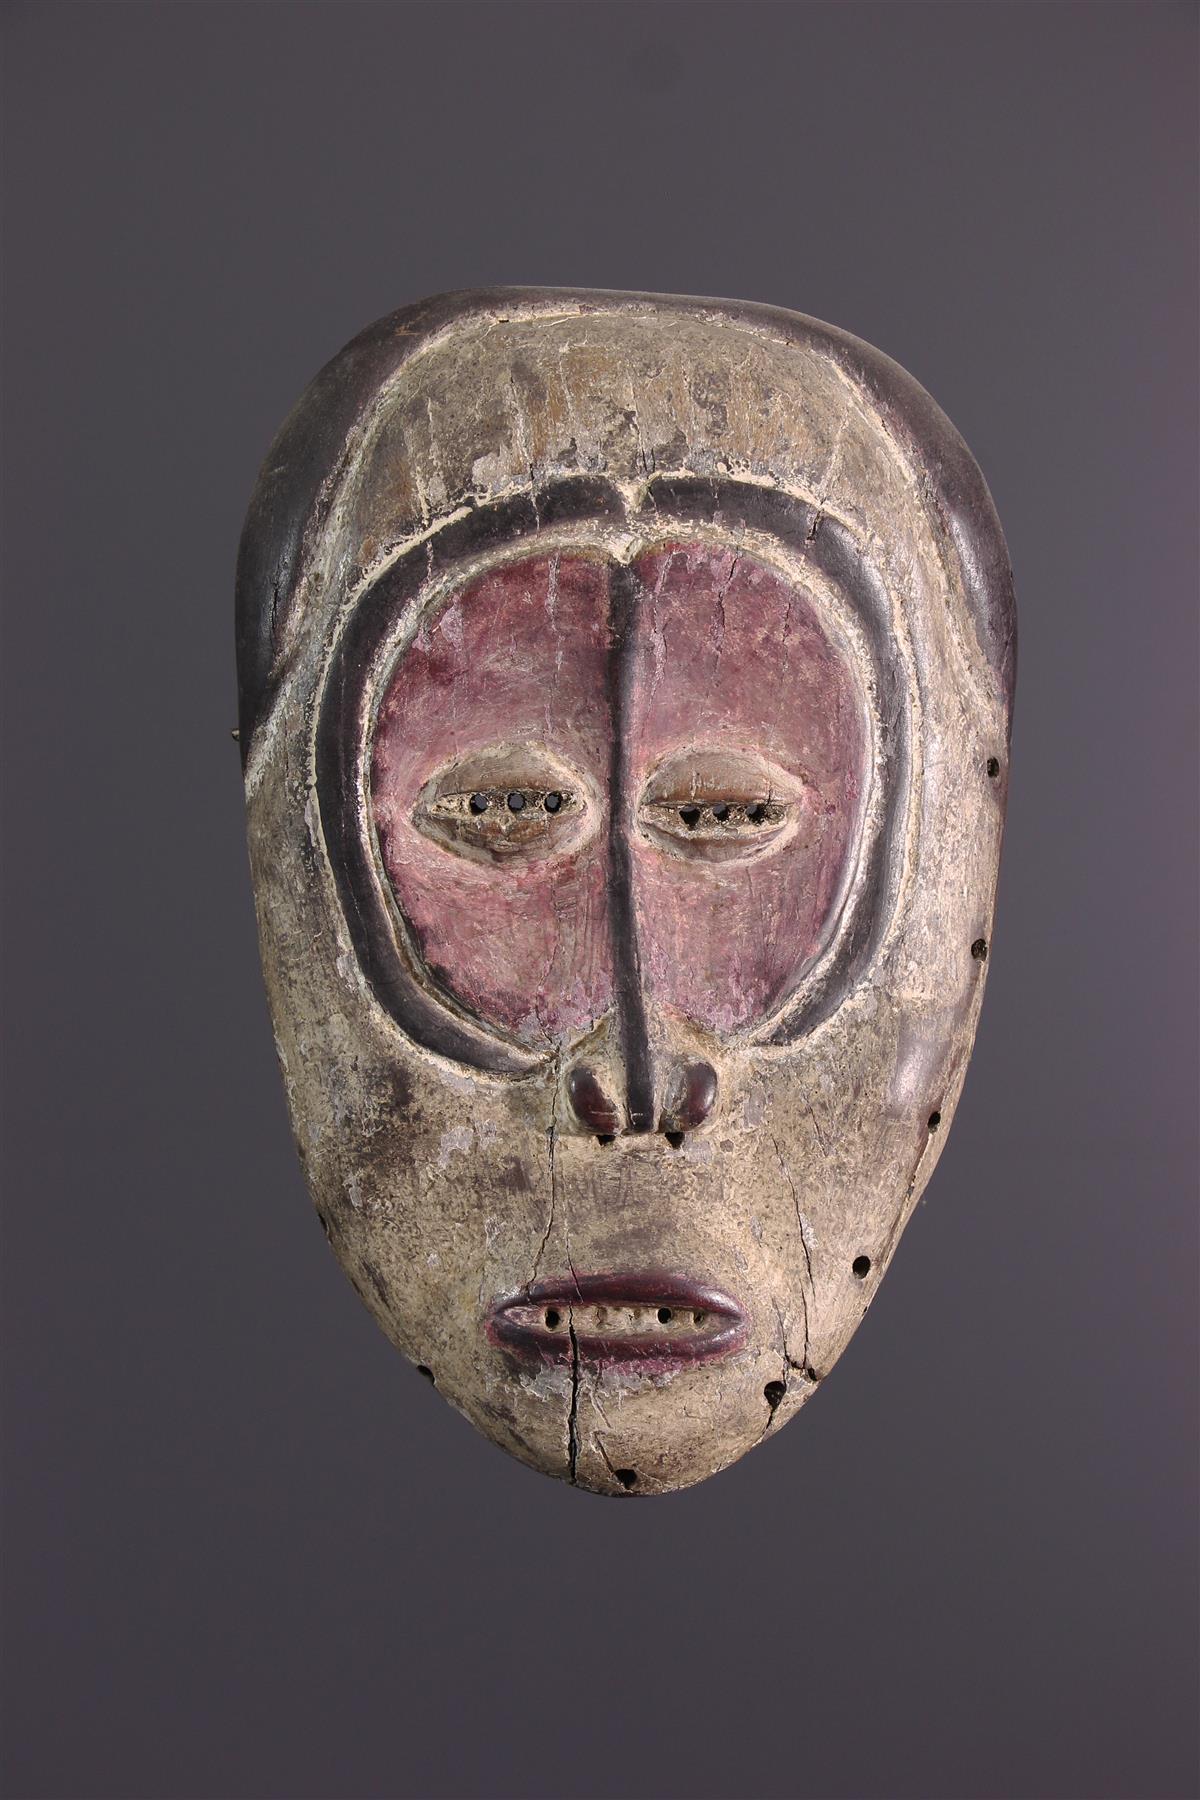 Ibibio mask - Tribal art